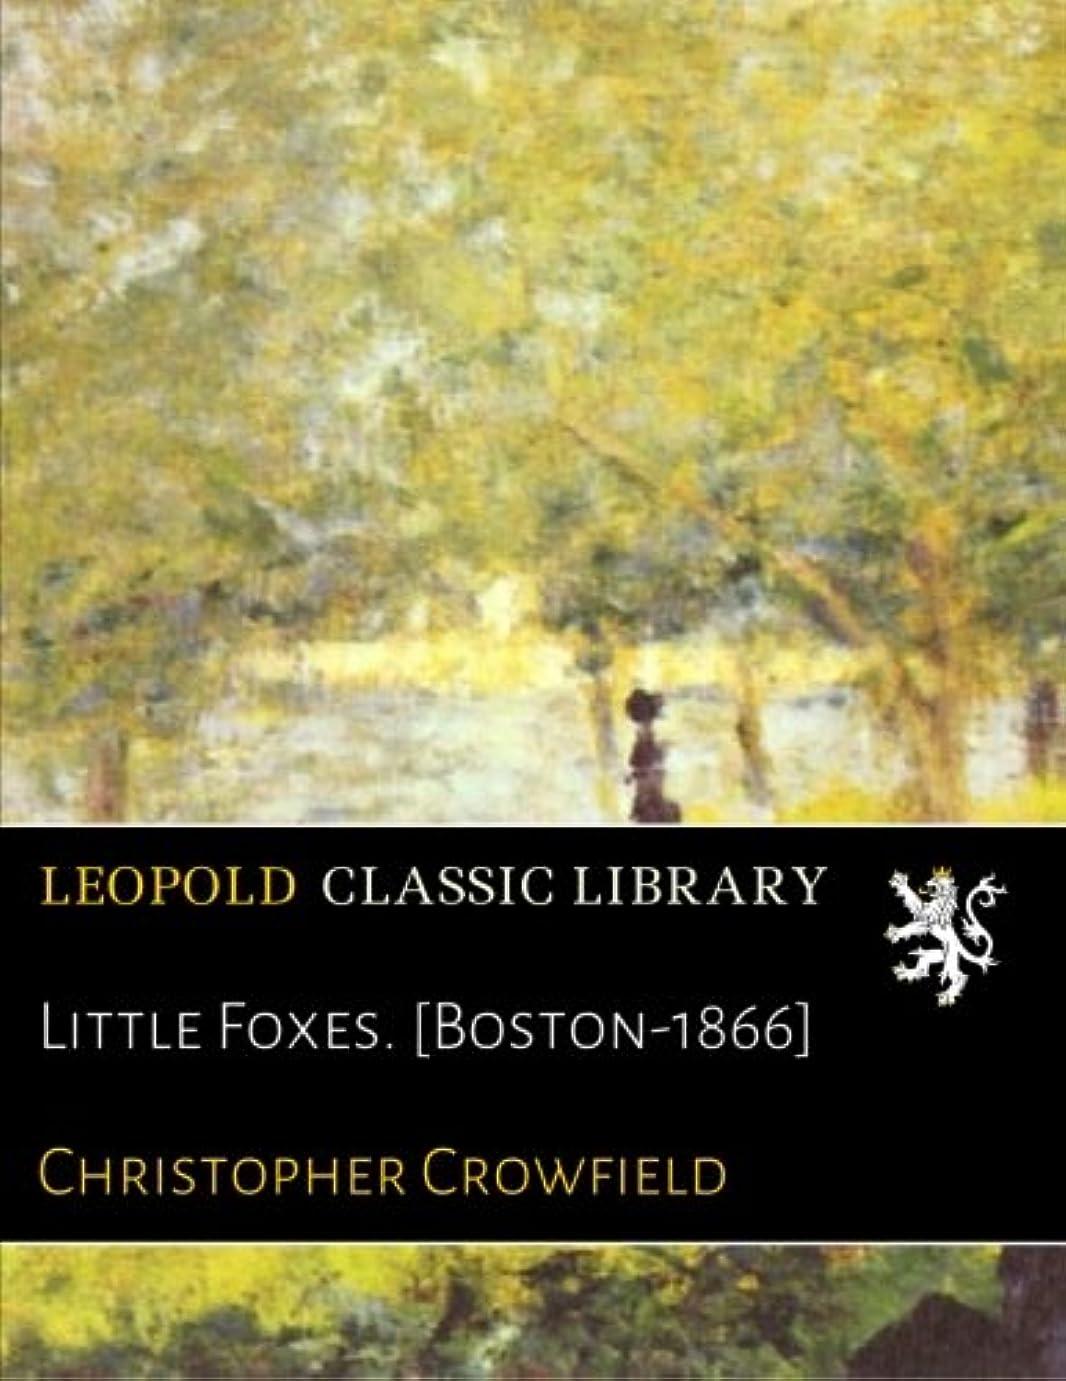 Little Foxes. [Boston-1866]